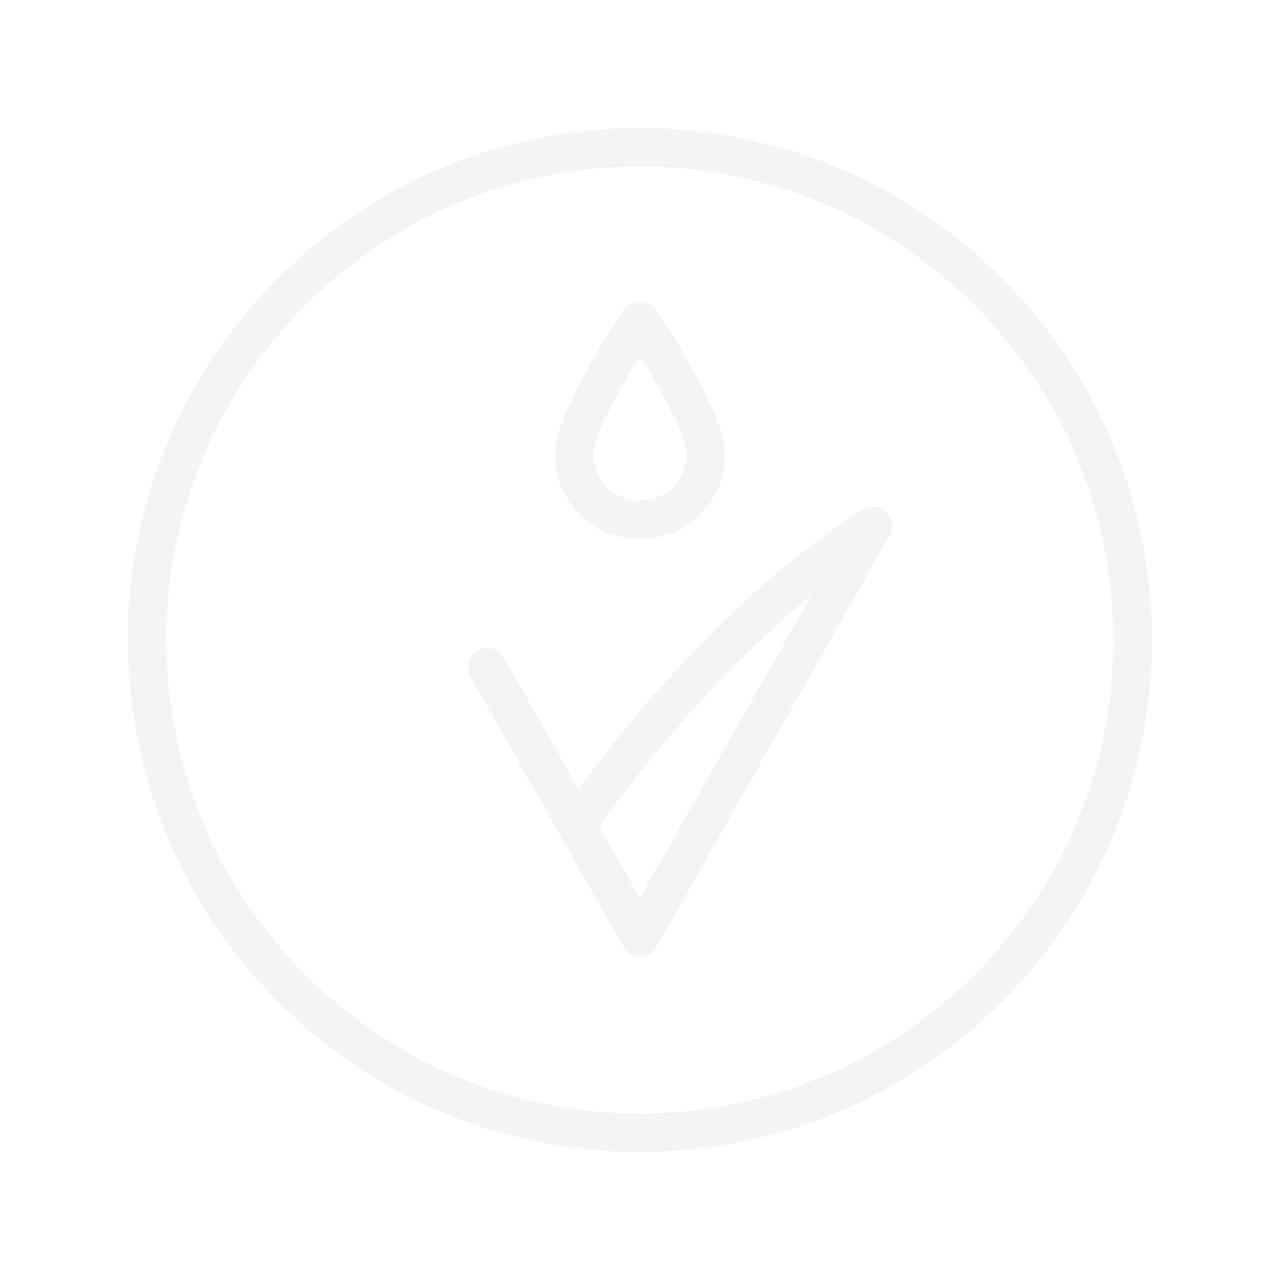 LIERAC Dioptifatigue Re-Energizing Eye Gel-Cream 15ml